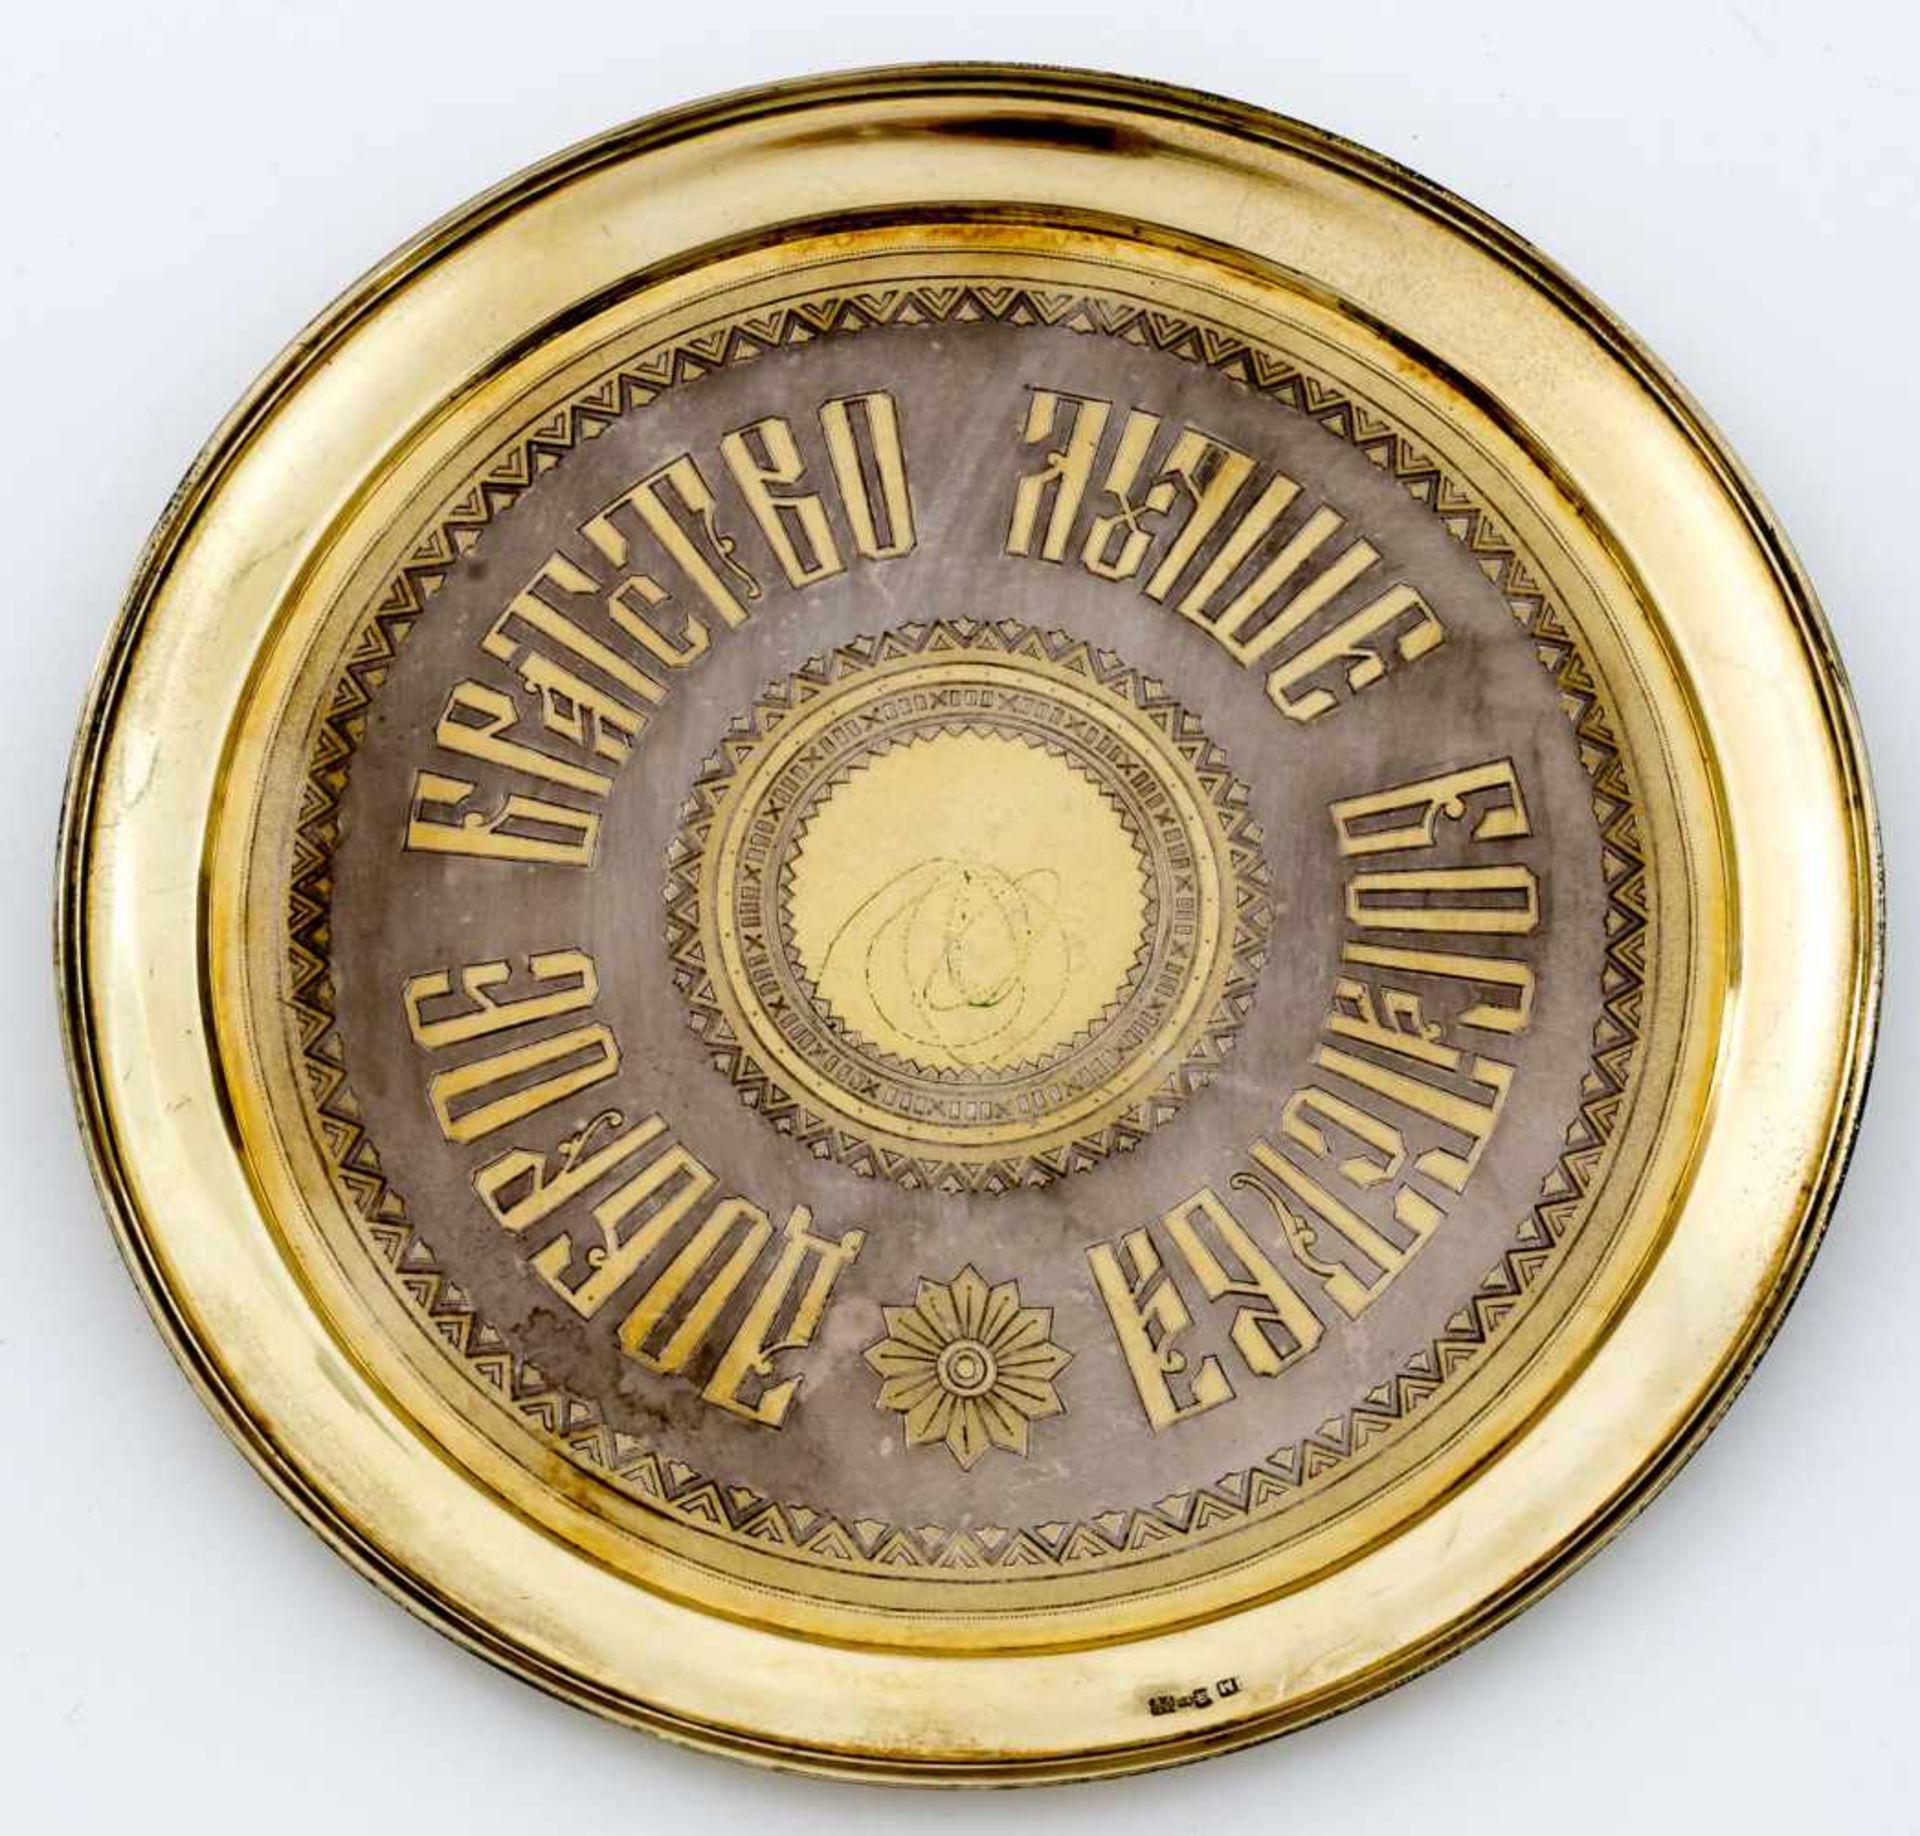 Präsentierteller Russland, Silber, teilvergoldet (359g), Moskau 1888 Beschaumeister Anatoly